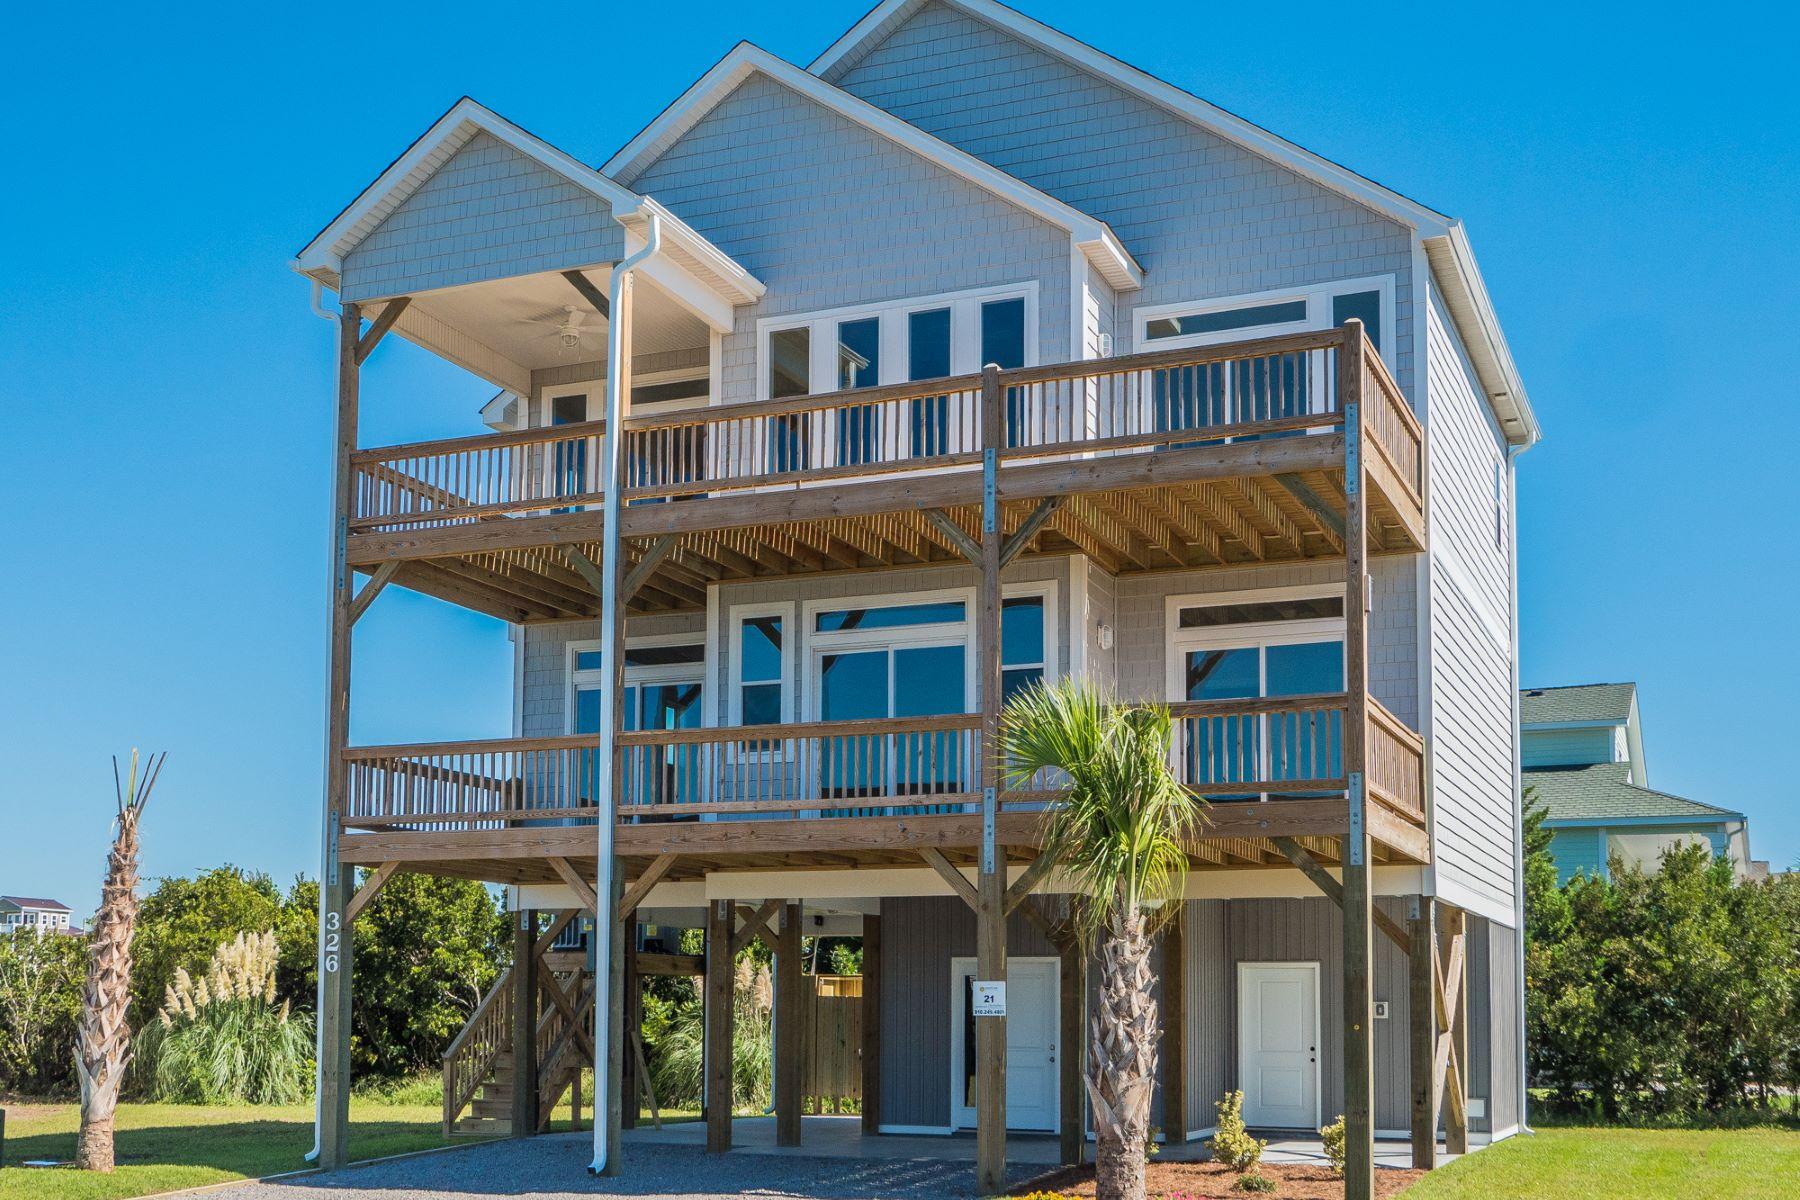 واحد منزل الأسرة للـ Sale في Island Home in Nautic Bay 314 Oceanaire Ln, Surf City, North Carolina, 28445 United States